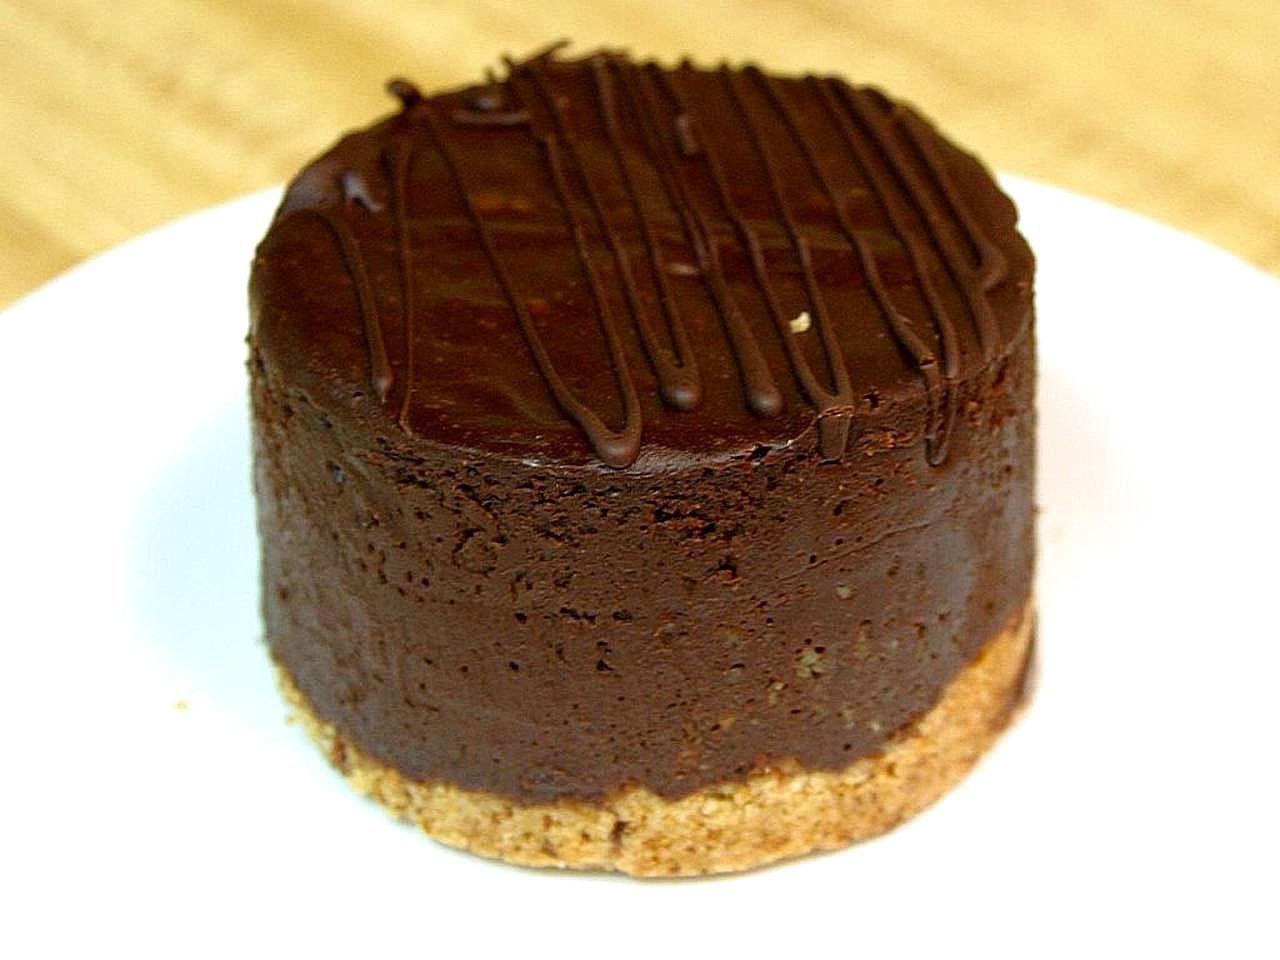 File:Chocolate dessert cake.jpg